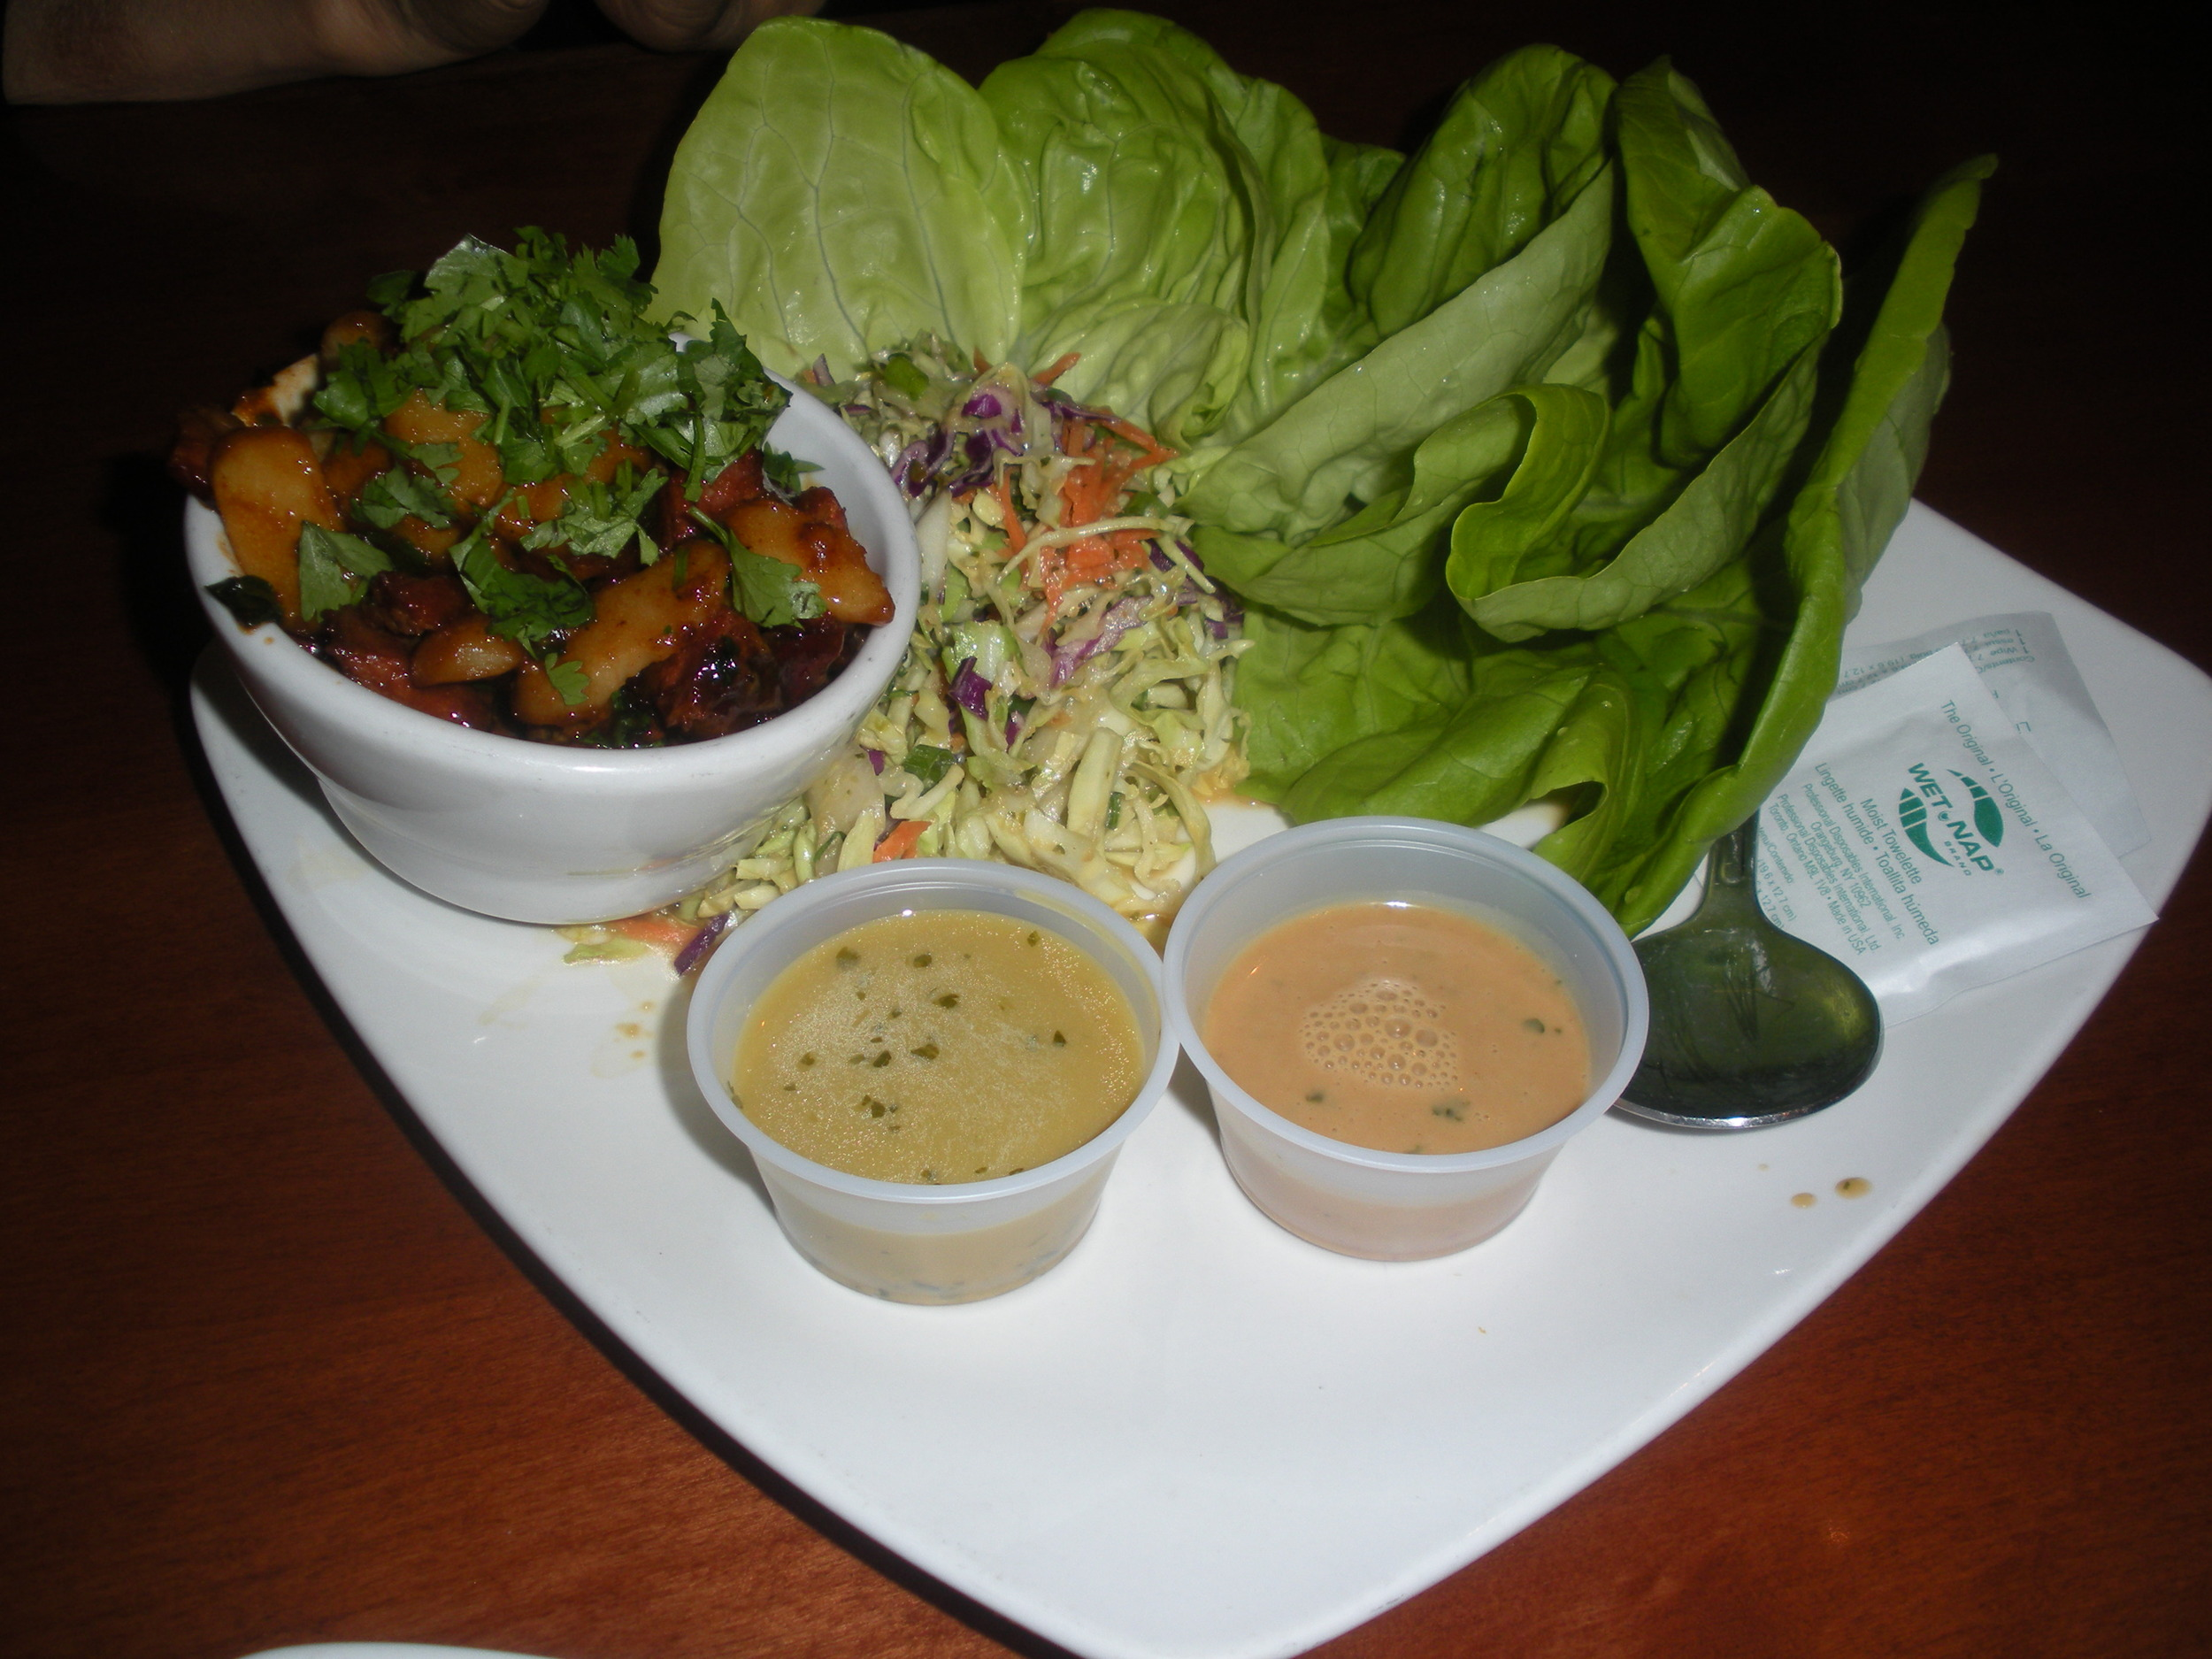 Shanghai_lettuce_wraps_from_Auburn_Alehouse.JPG